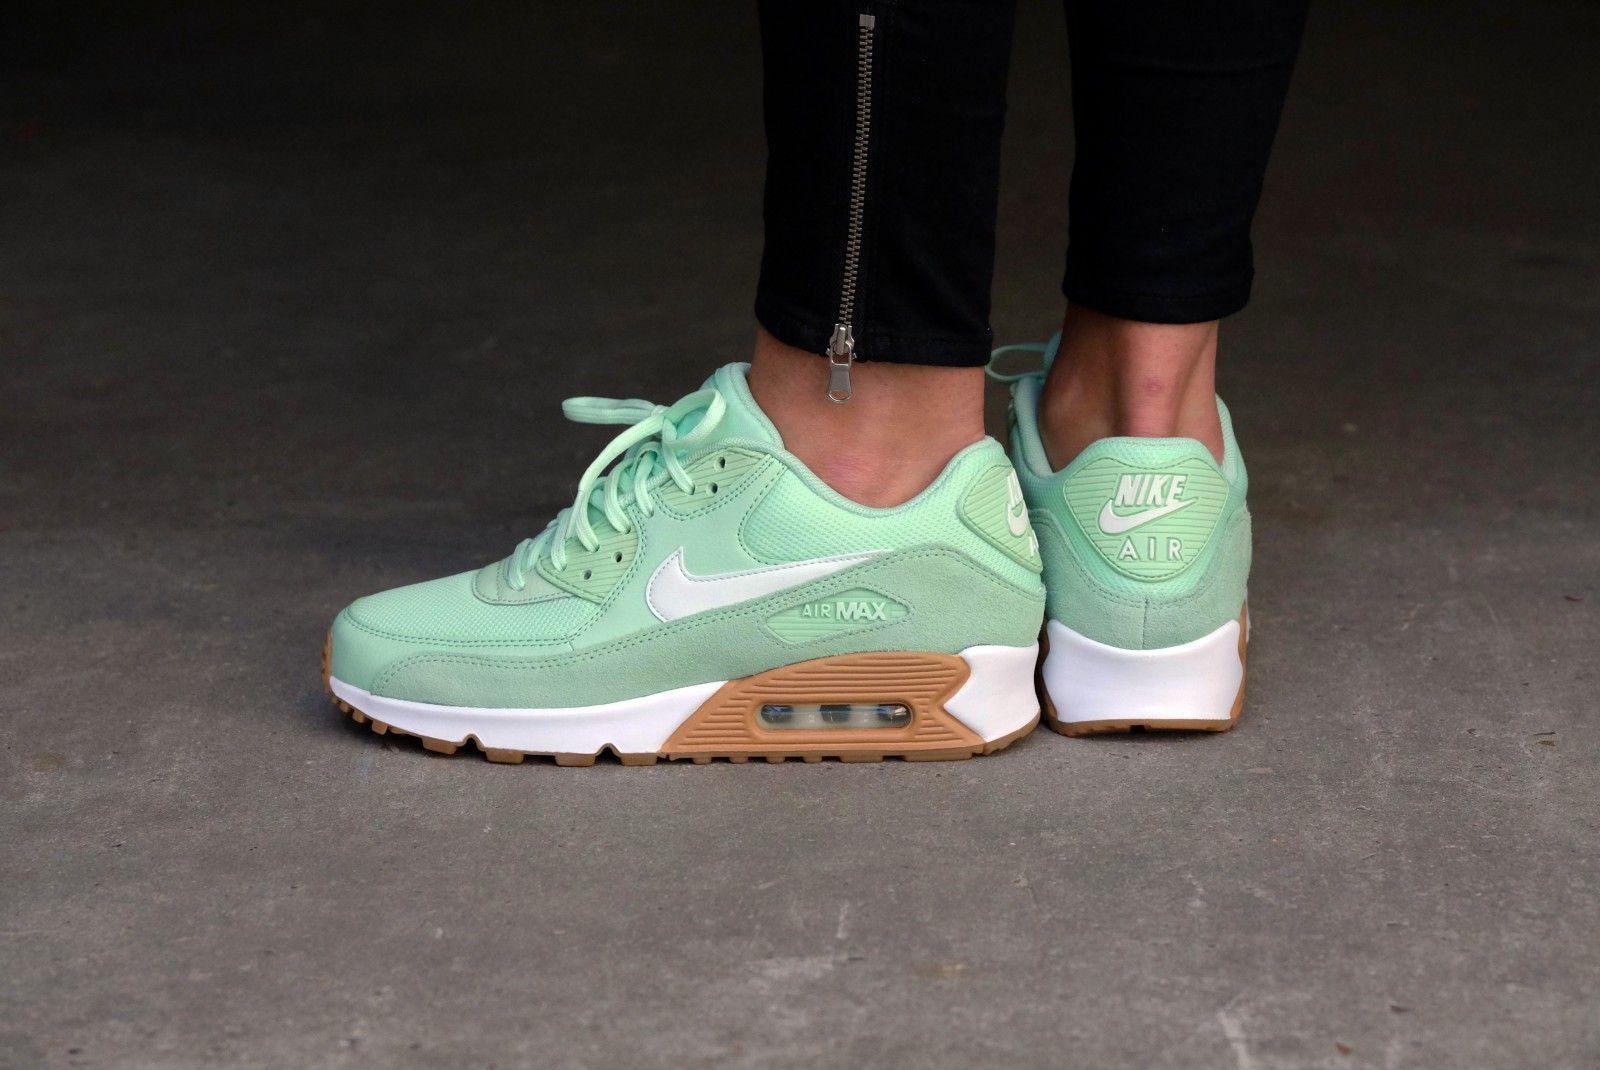 Nike WMNS Air Max 90 Fresh MintBarely Green Gum Light Brown